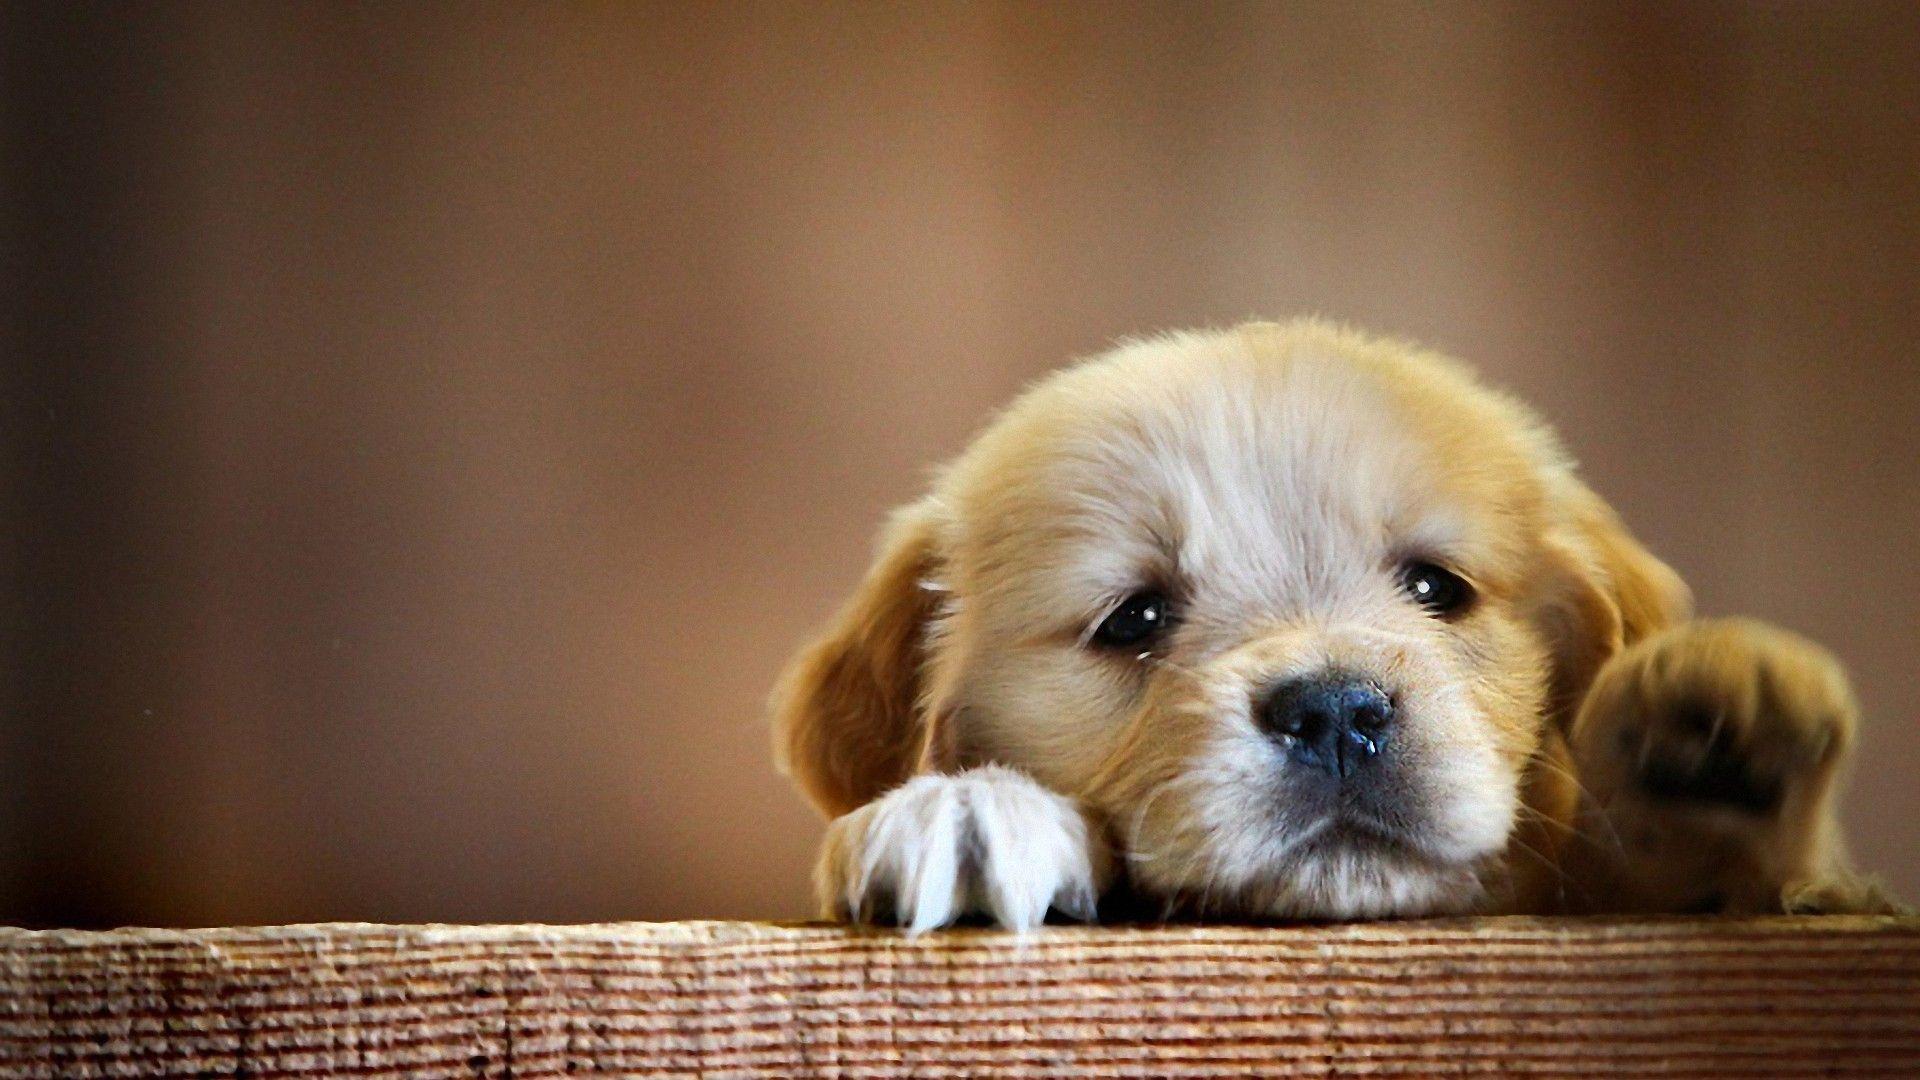 cute dog hd wallpaper 1080p